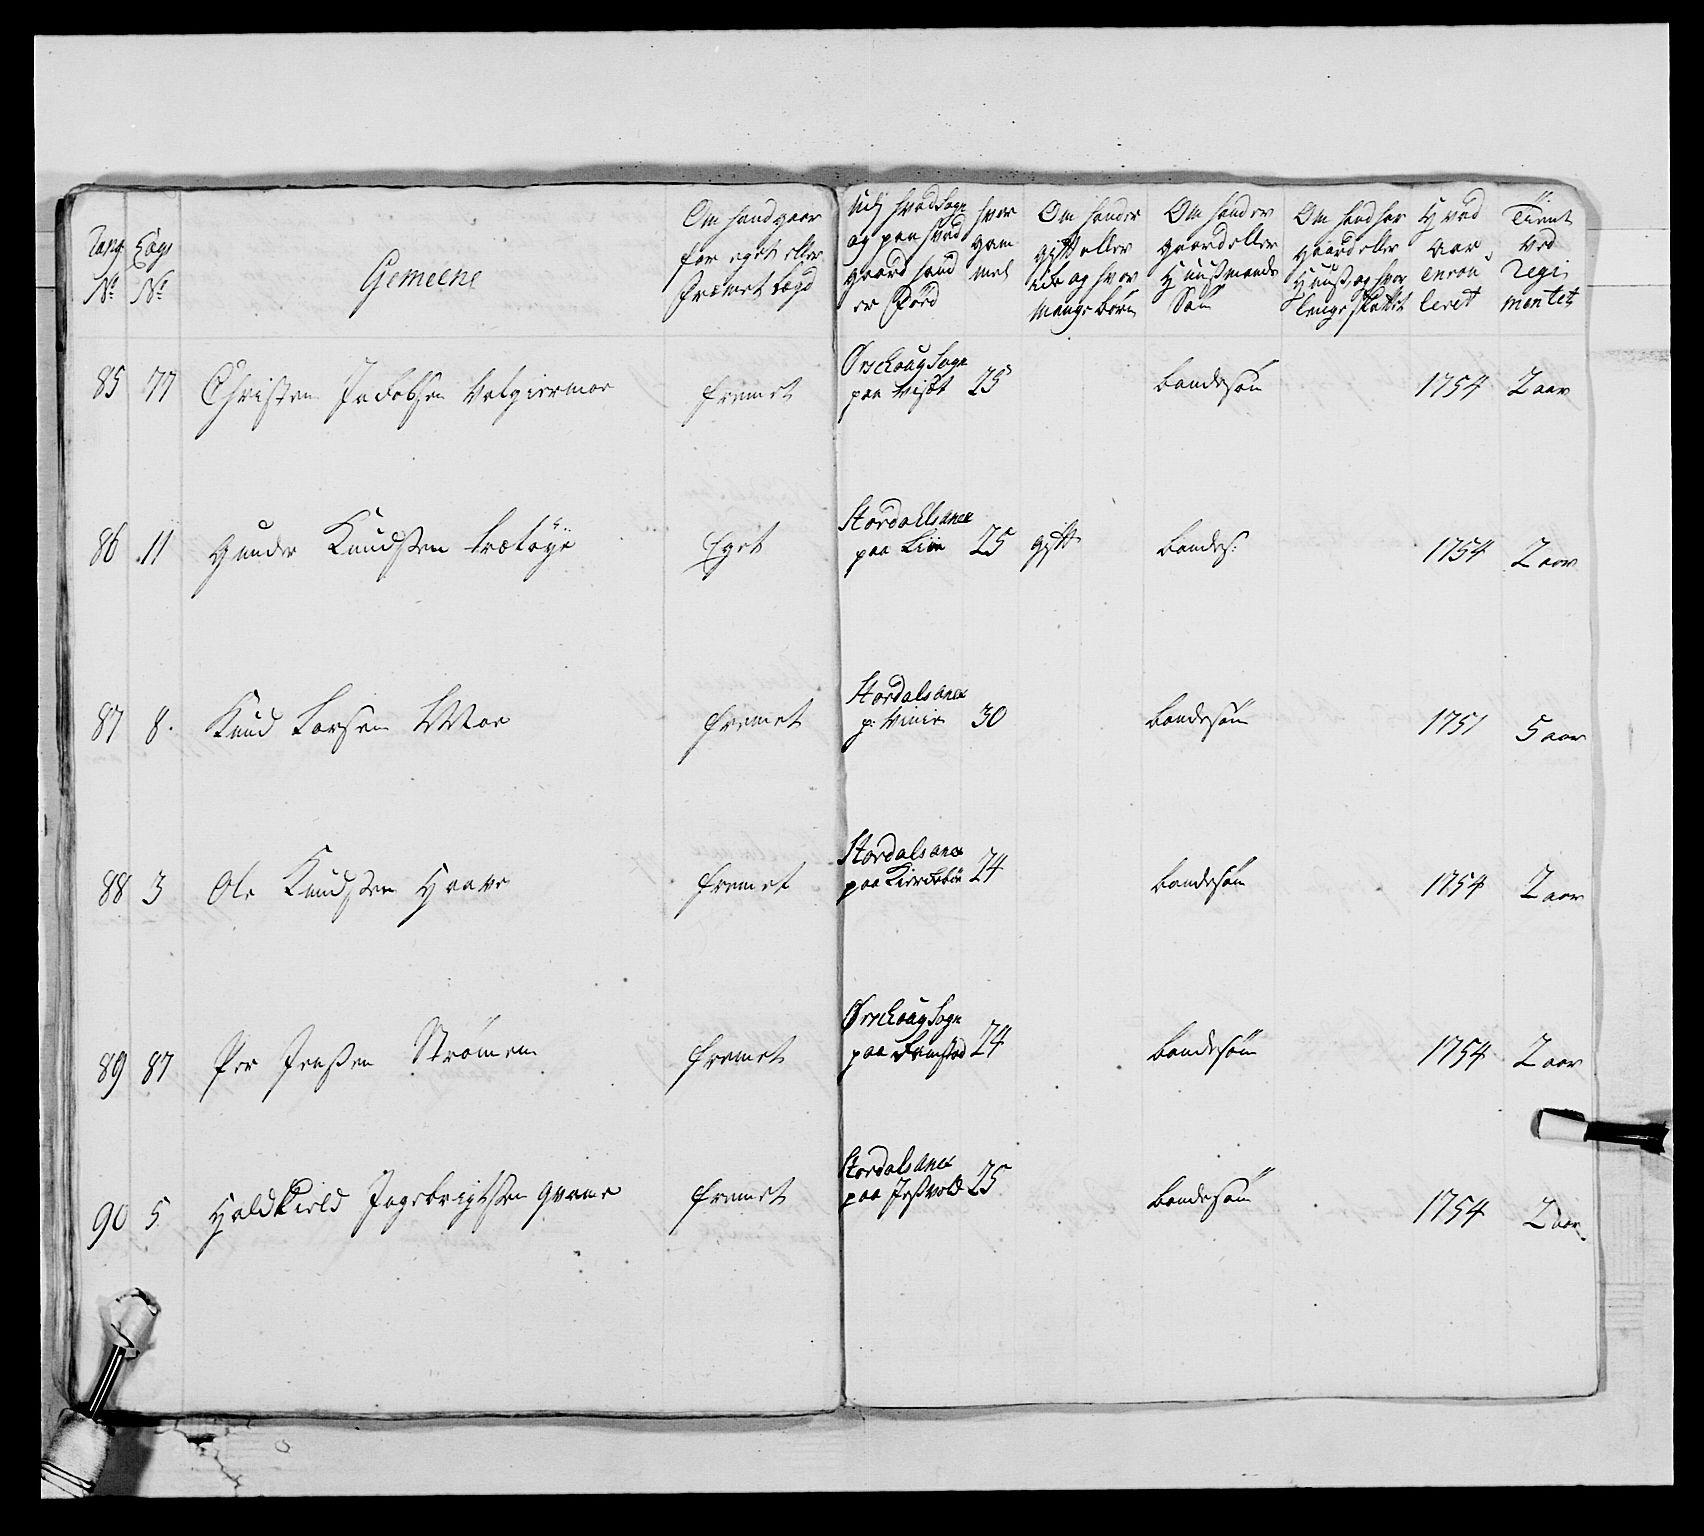 RA, Kommanderende general (KG I) med Det norske krigsdirektorium, E/Ea/L0517: 1. Bergenhusiske regiment, 1742-1756, s. 257